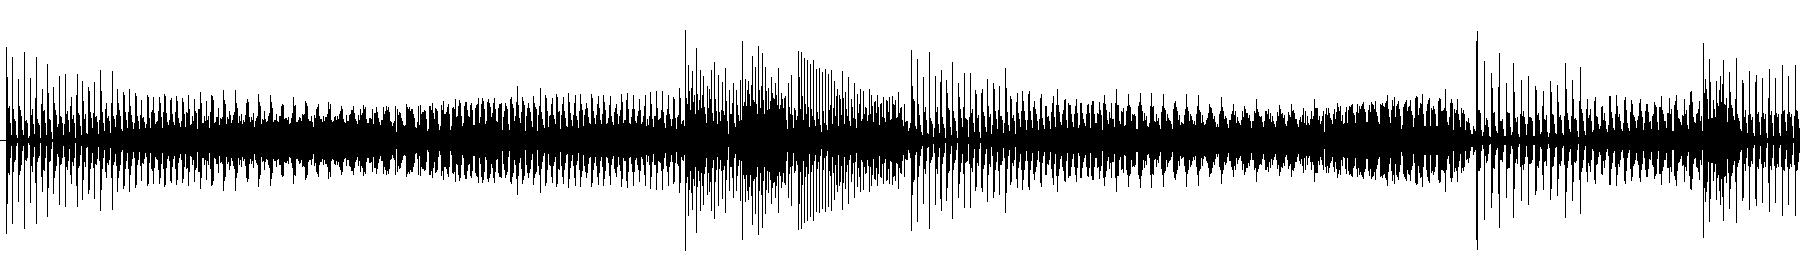 90 a 1